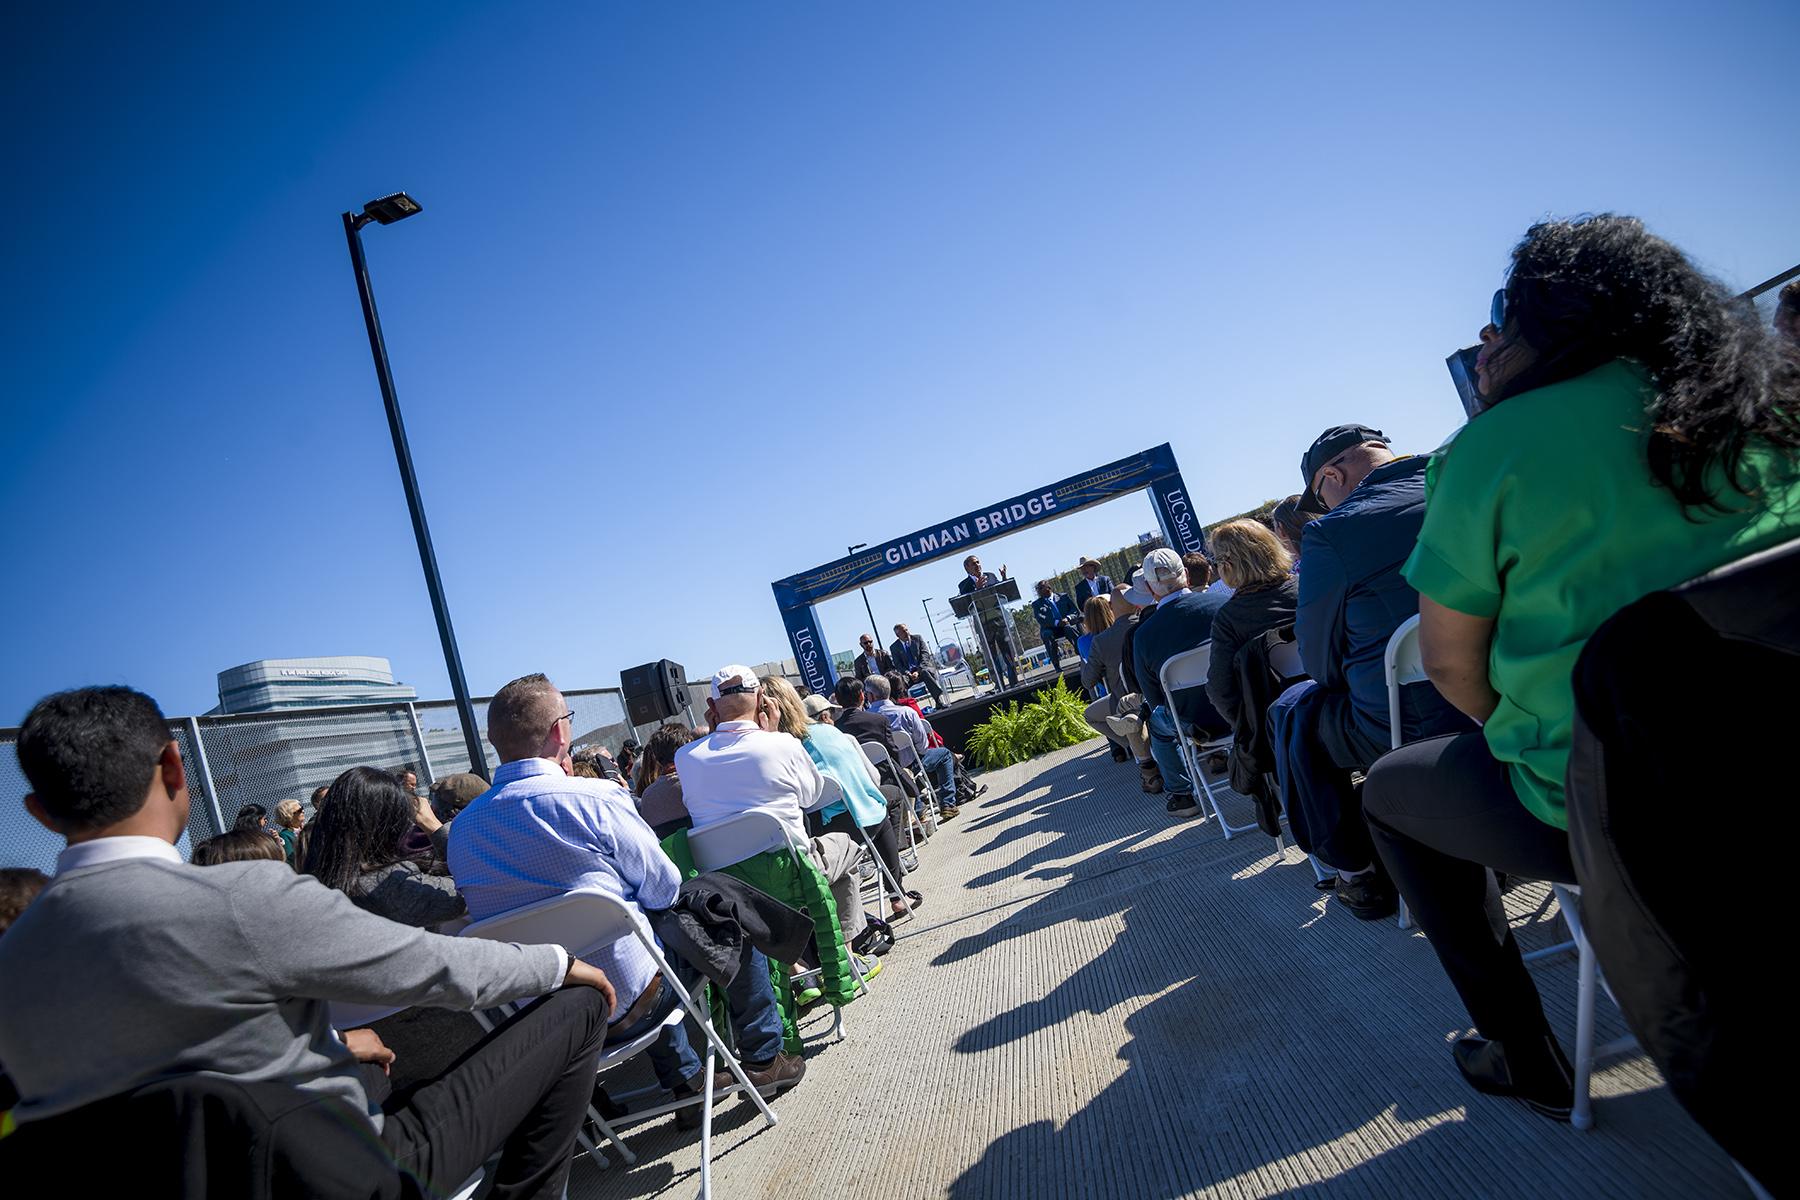 Gilman Bridge opening celebration